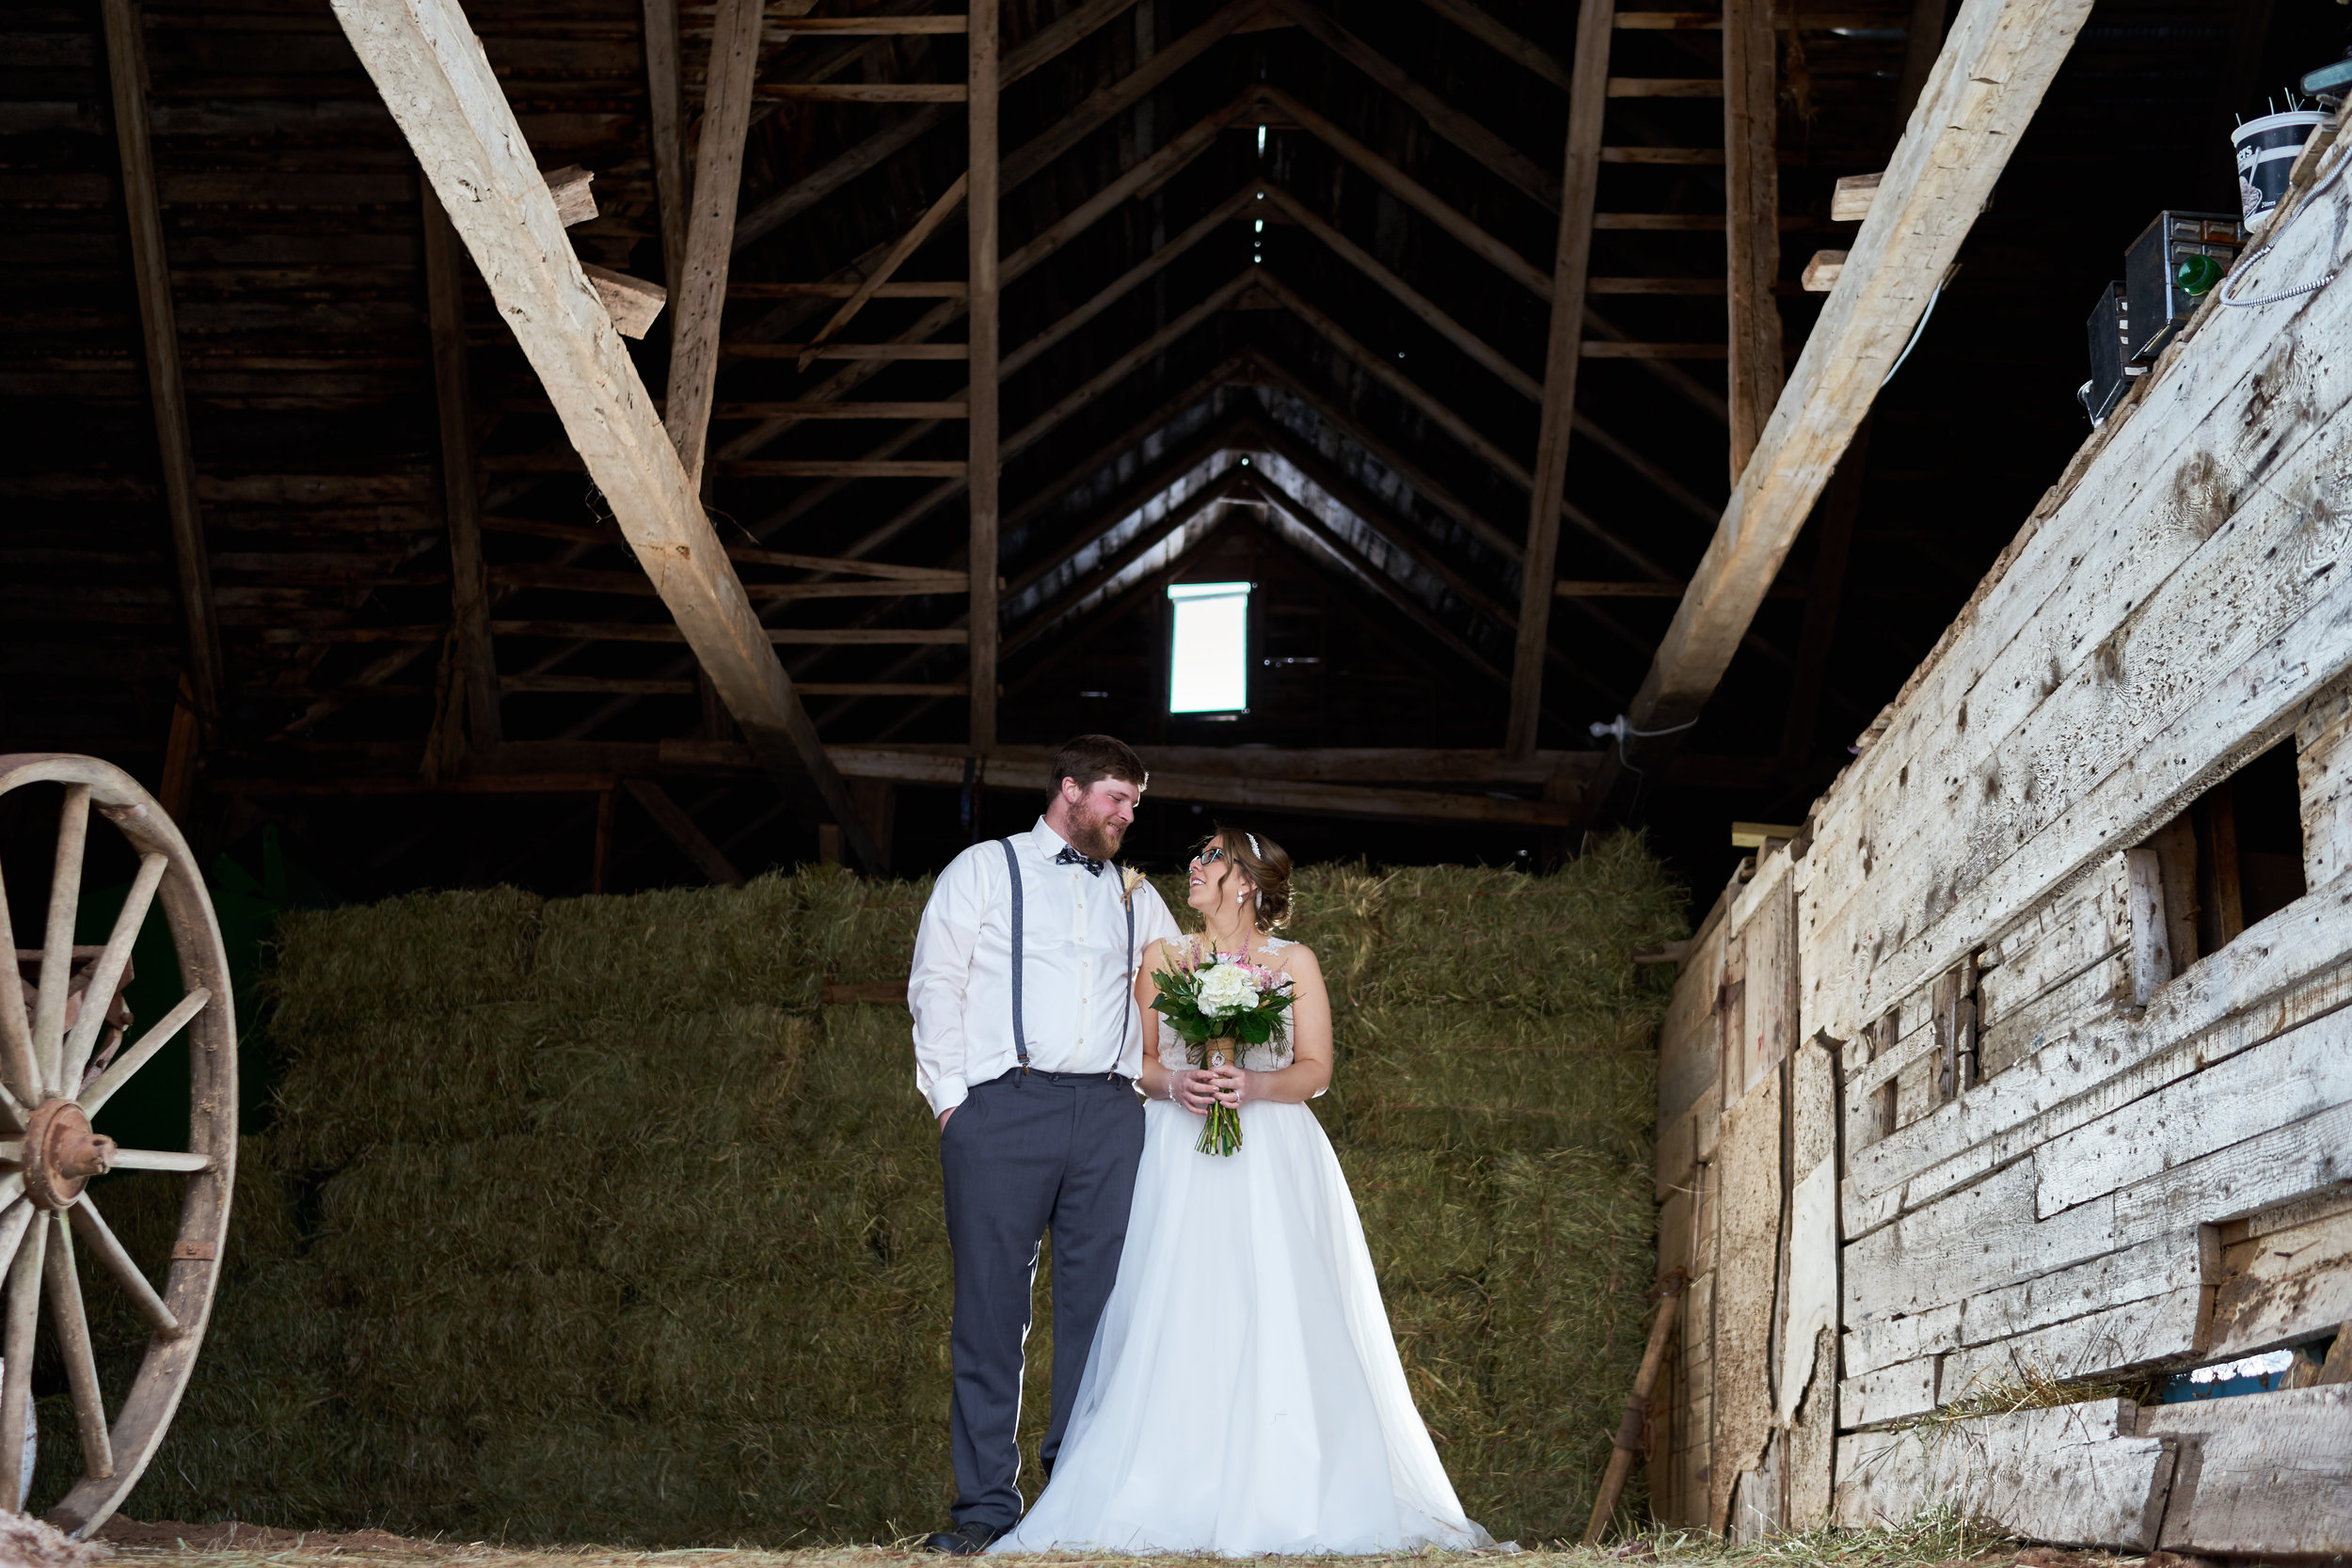 Fast forward to Amanda & Ben's wedding